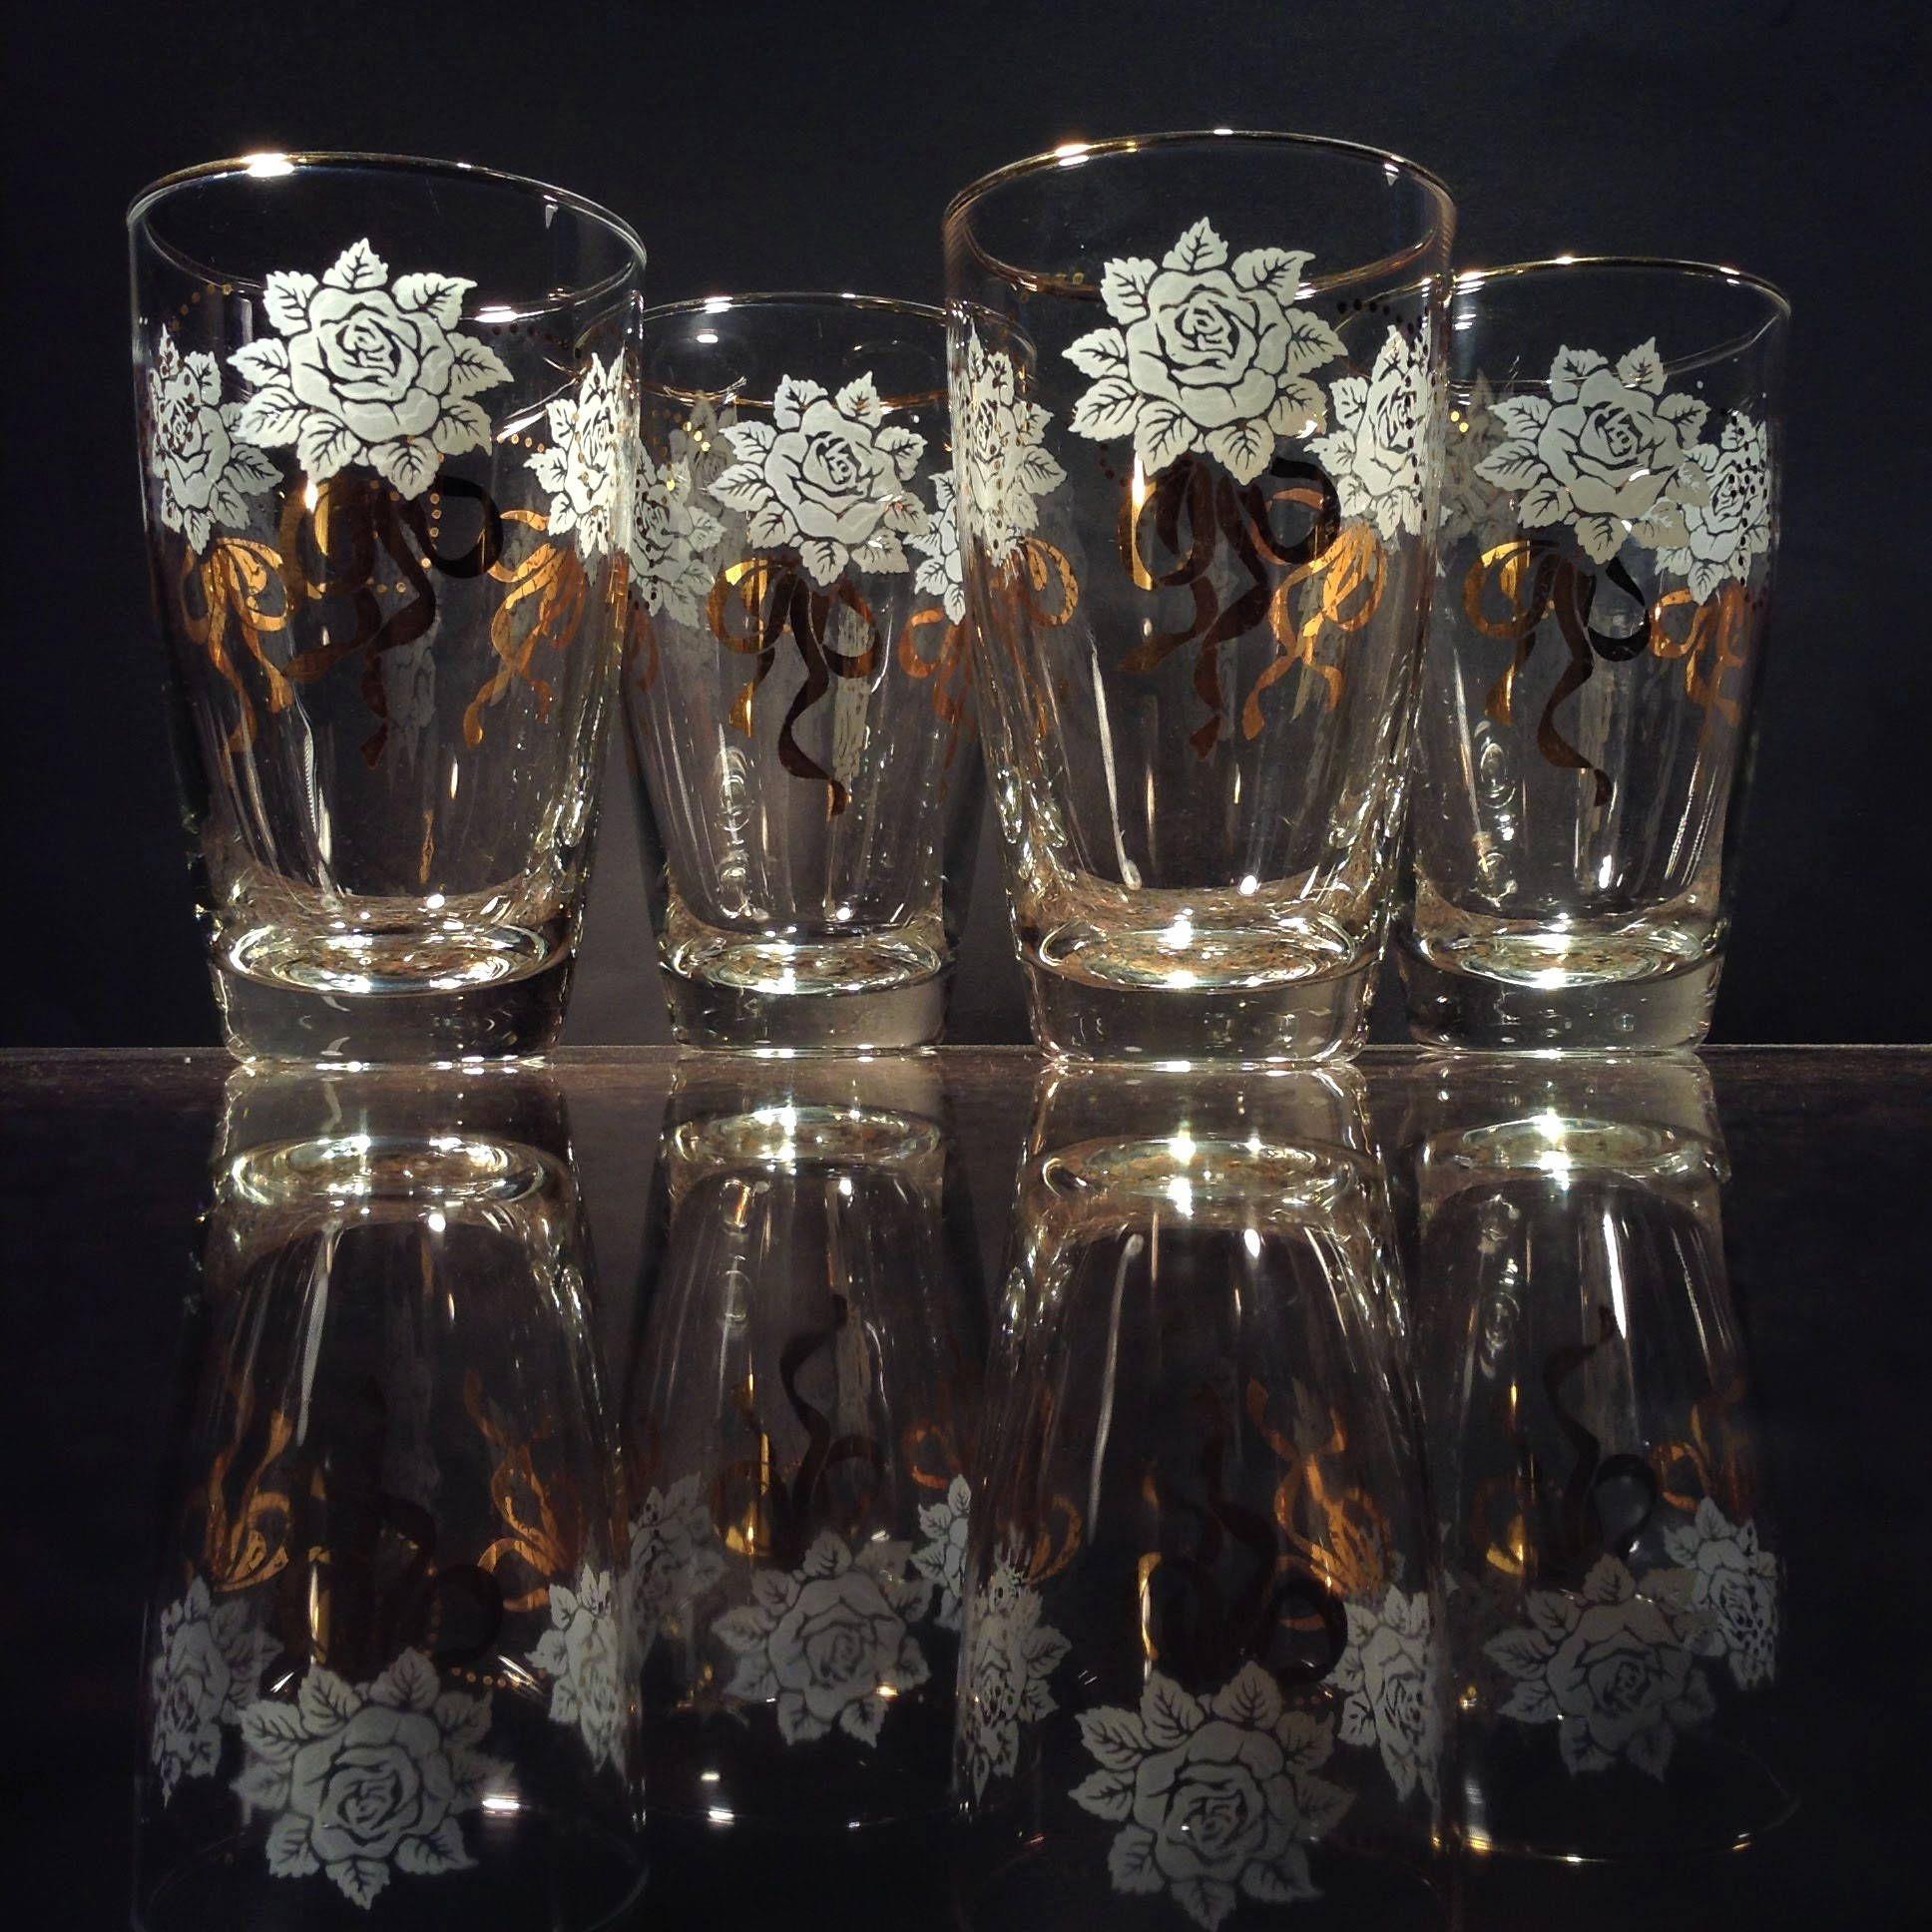 Vintage Glass Tumblers 4 Rose And Ribbon Drinking Glasses Libbey Glass White Roses 22k Gold Ribbon Tumbler Vintage Glassware Rose Gold Ribbon Glass Tumbler